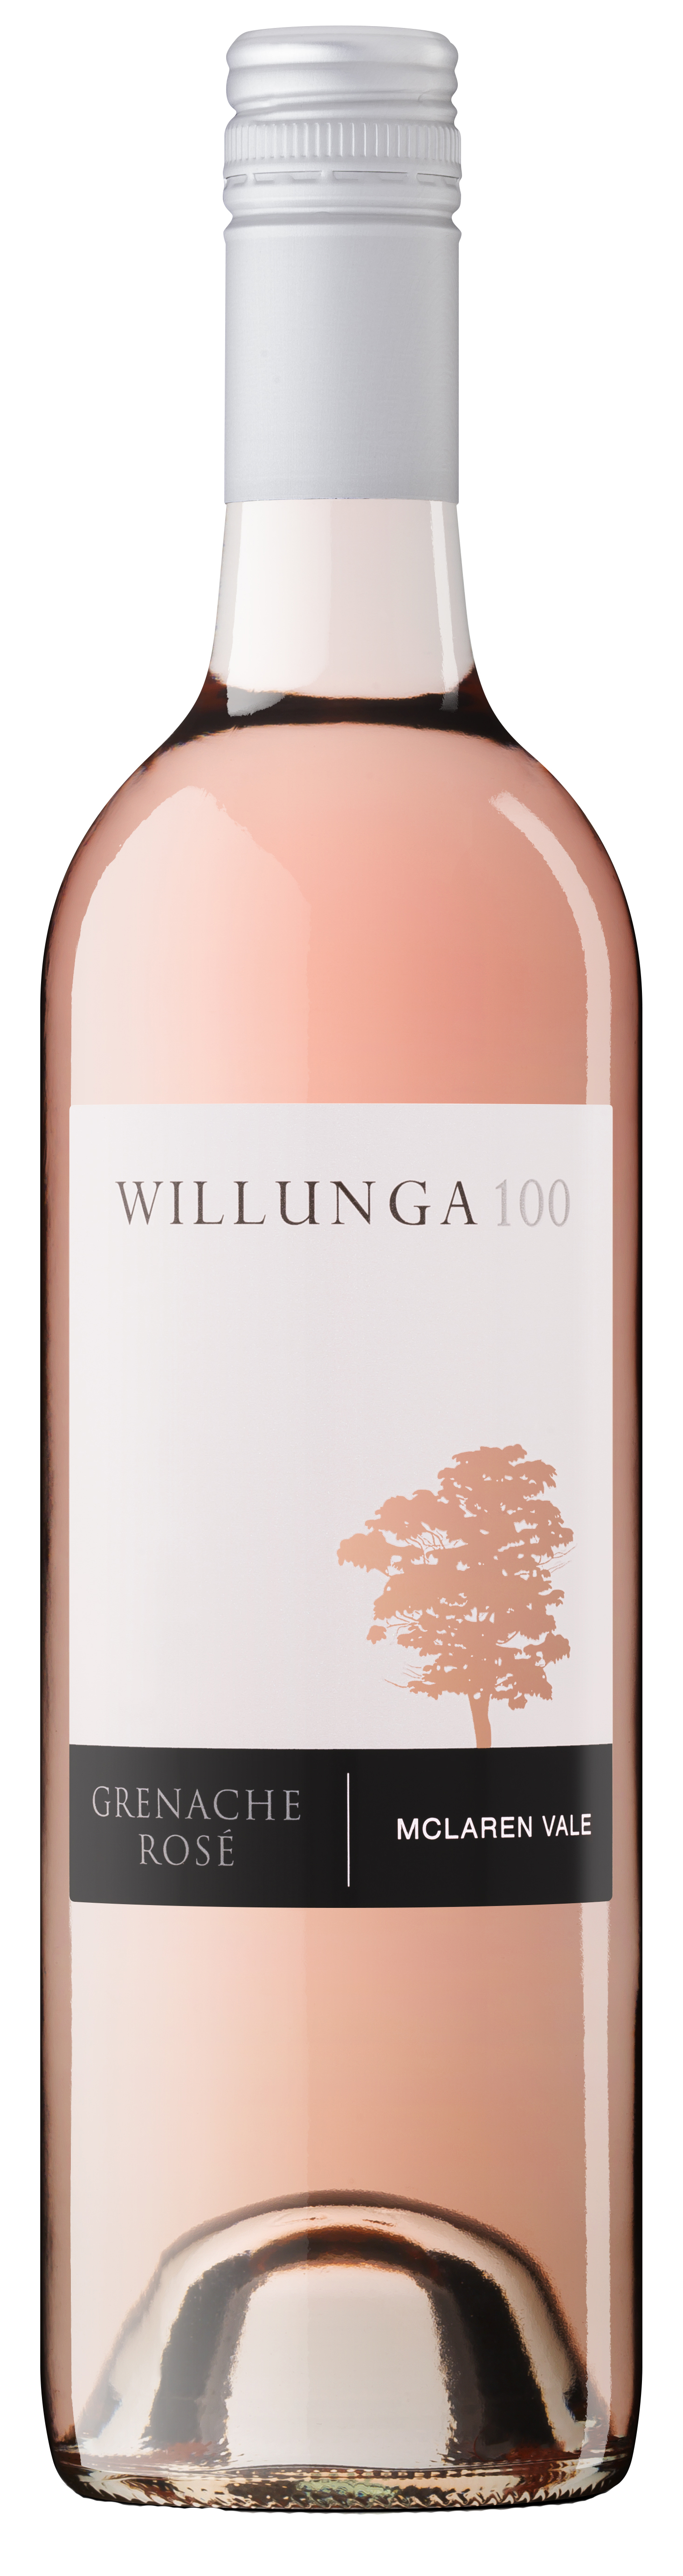 Willunga 100, Grenache Rosé 2017